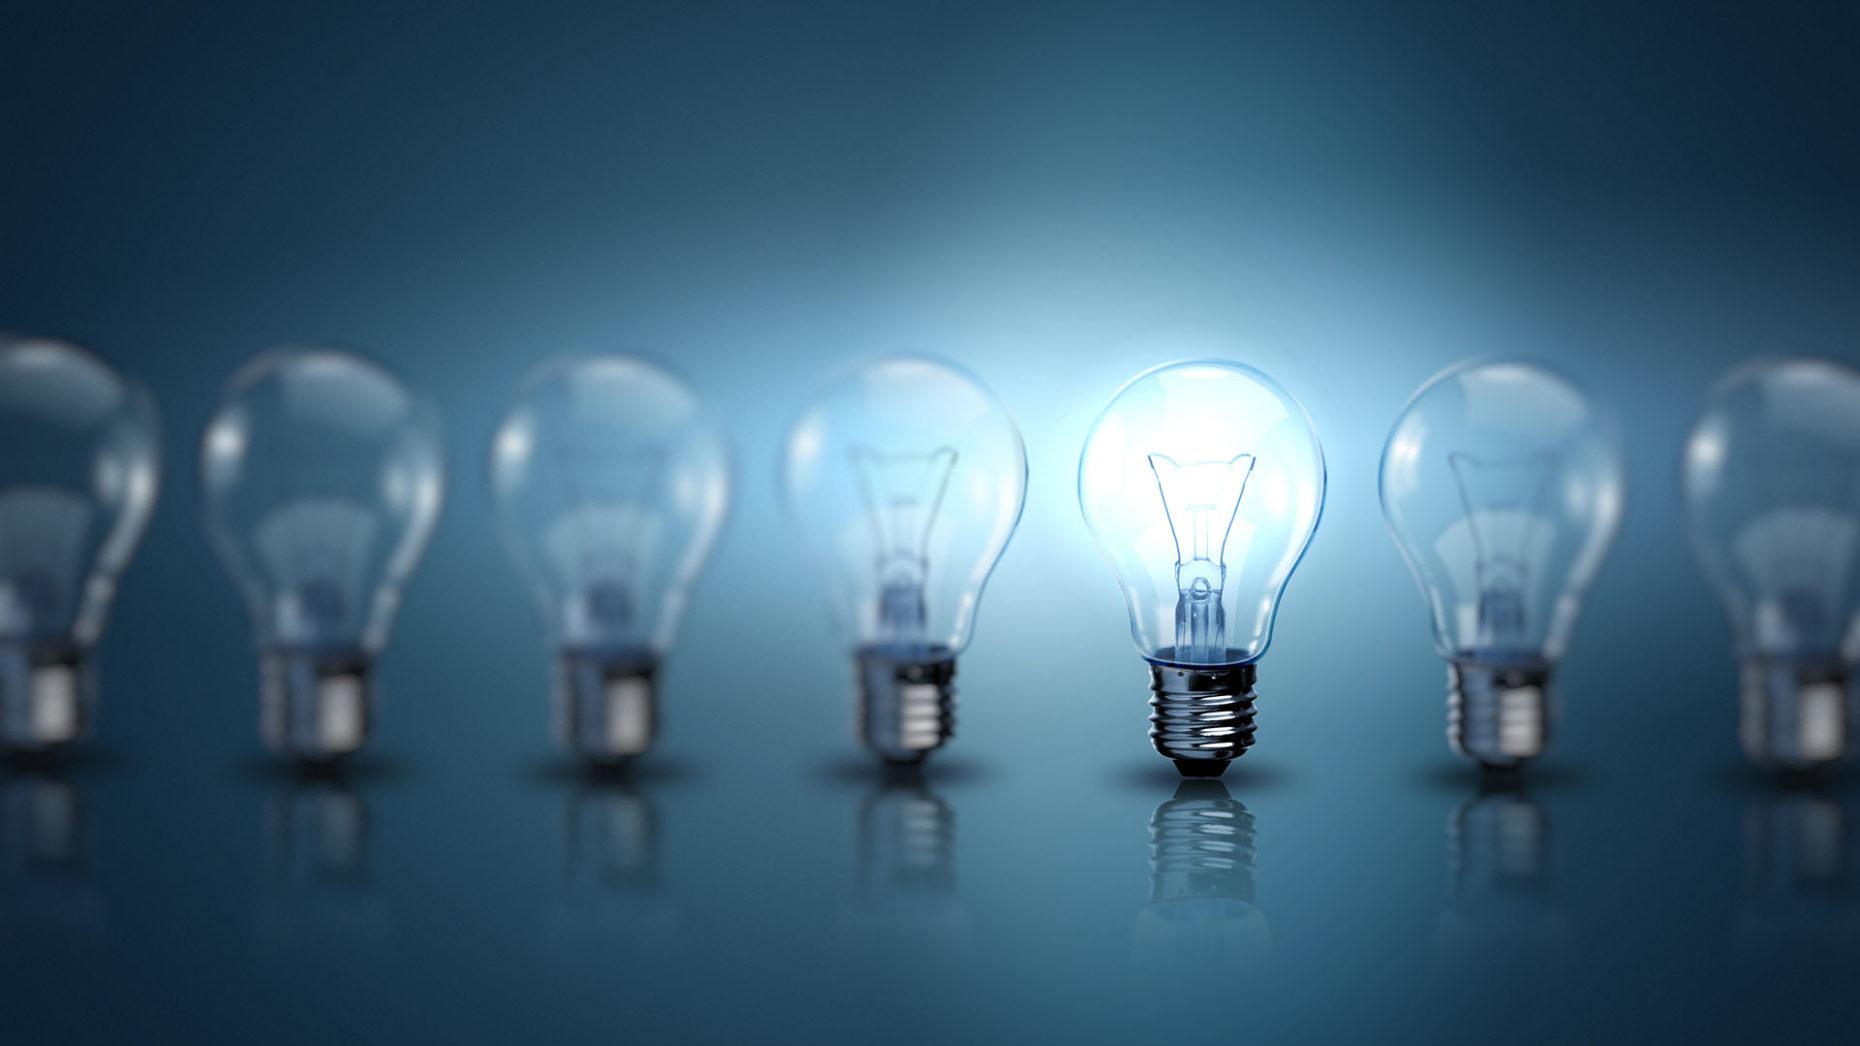 innovationsentwicklung